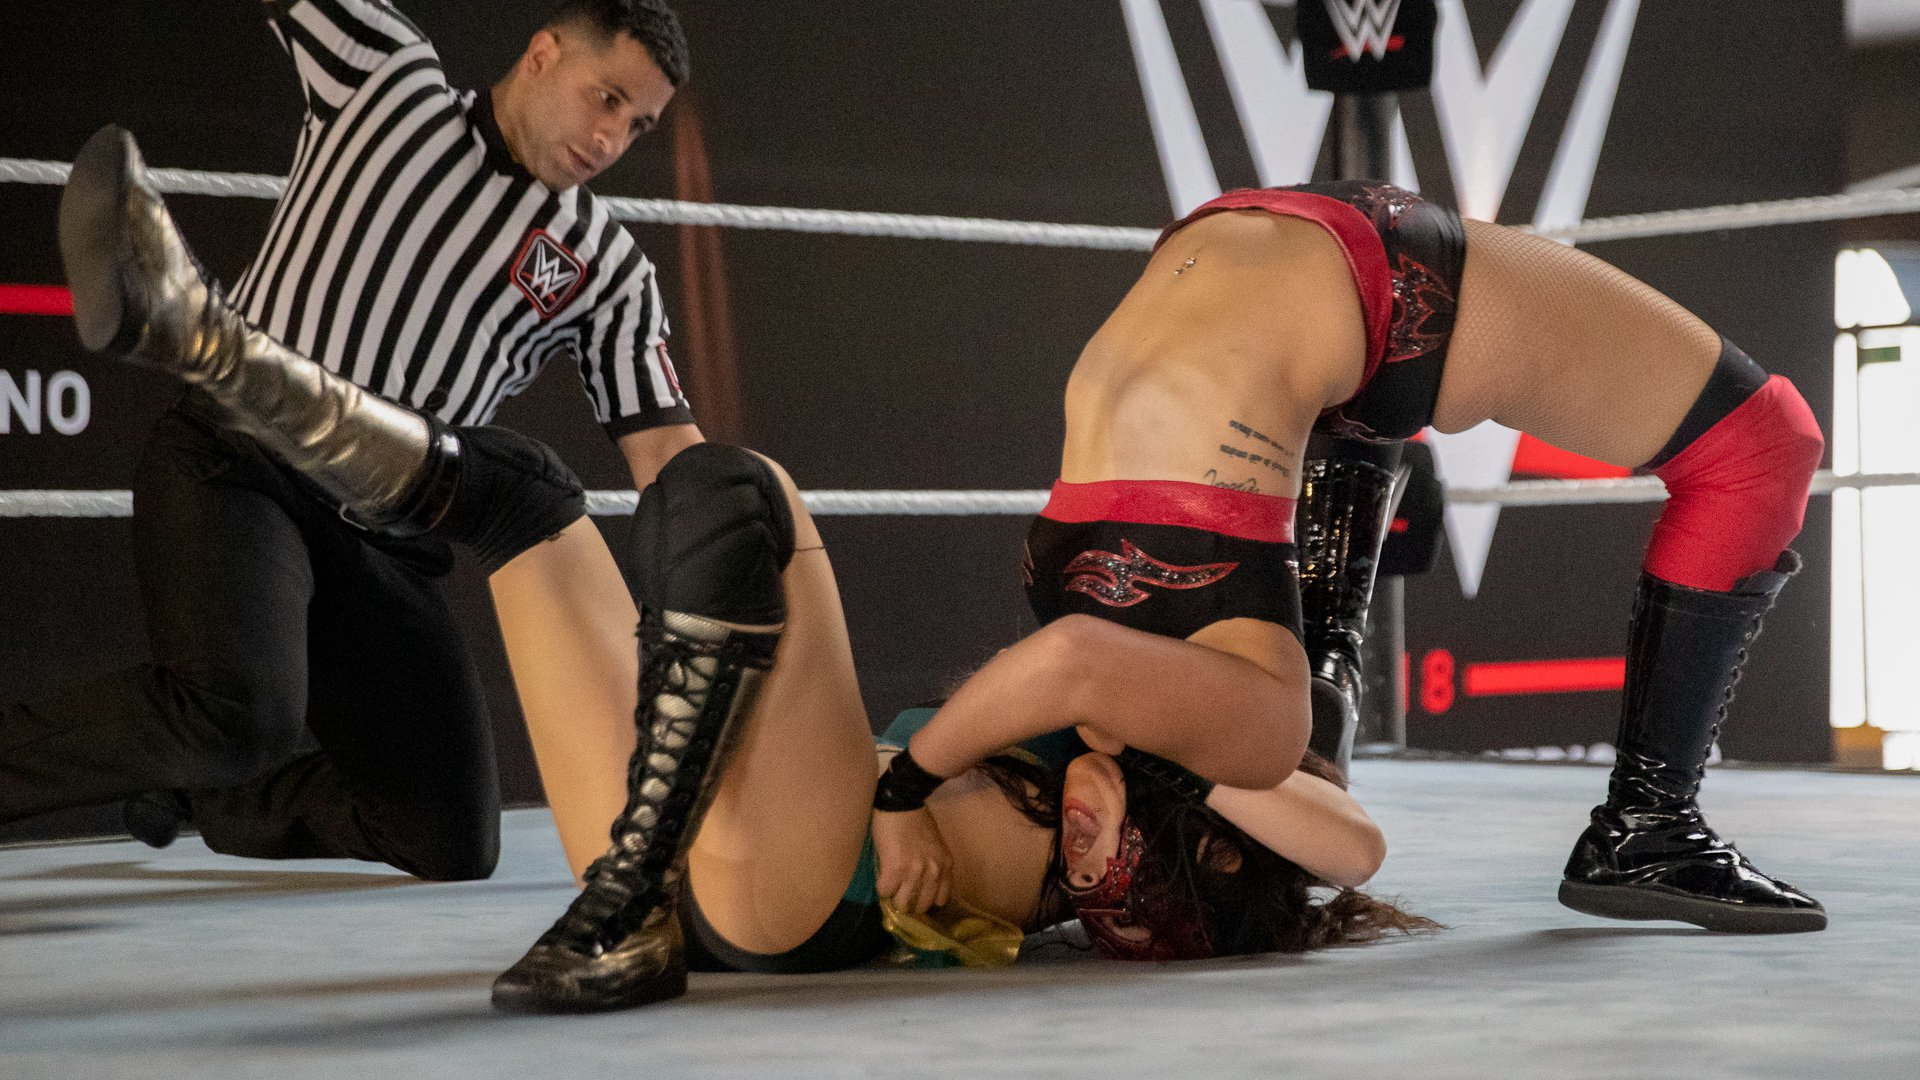 Luchadoras Lady Maravilla and Zatara kick off a session of exhibition matches.